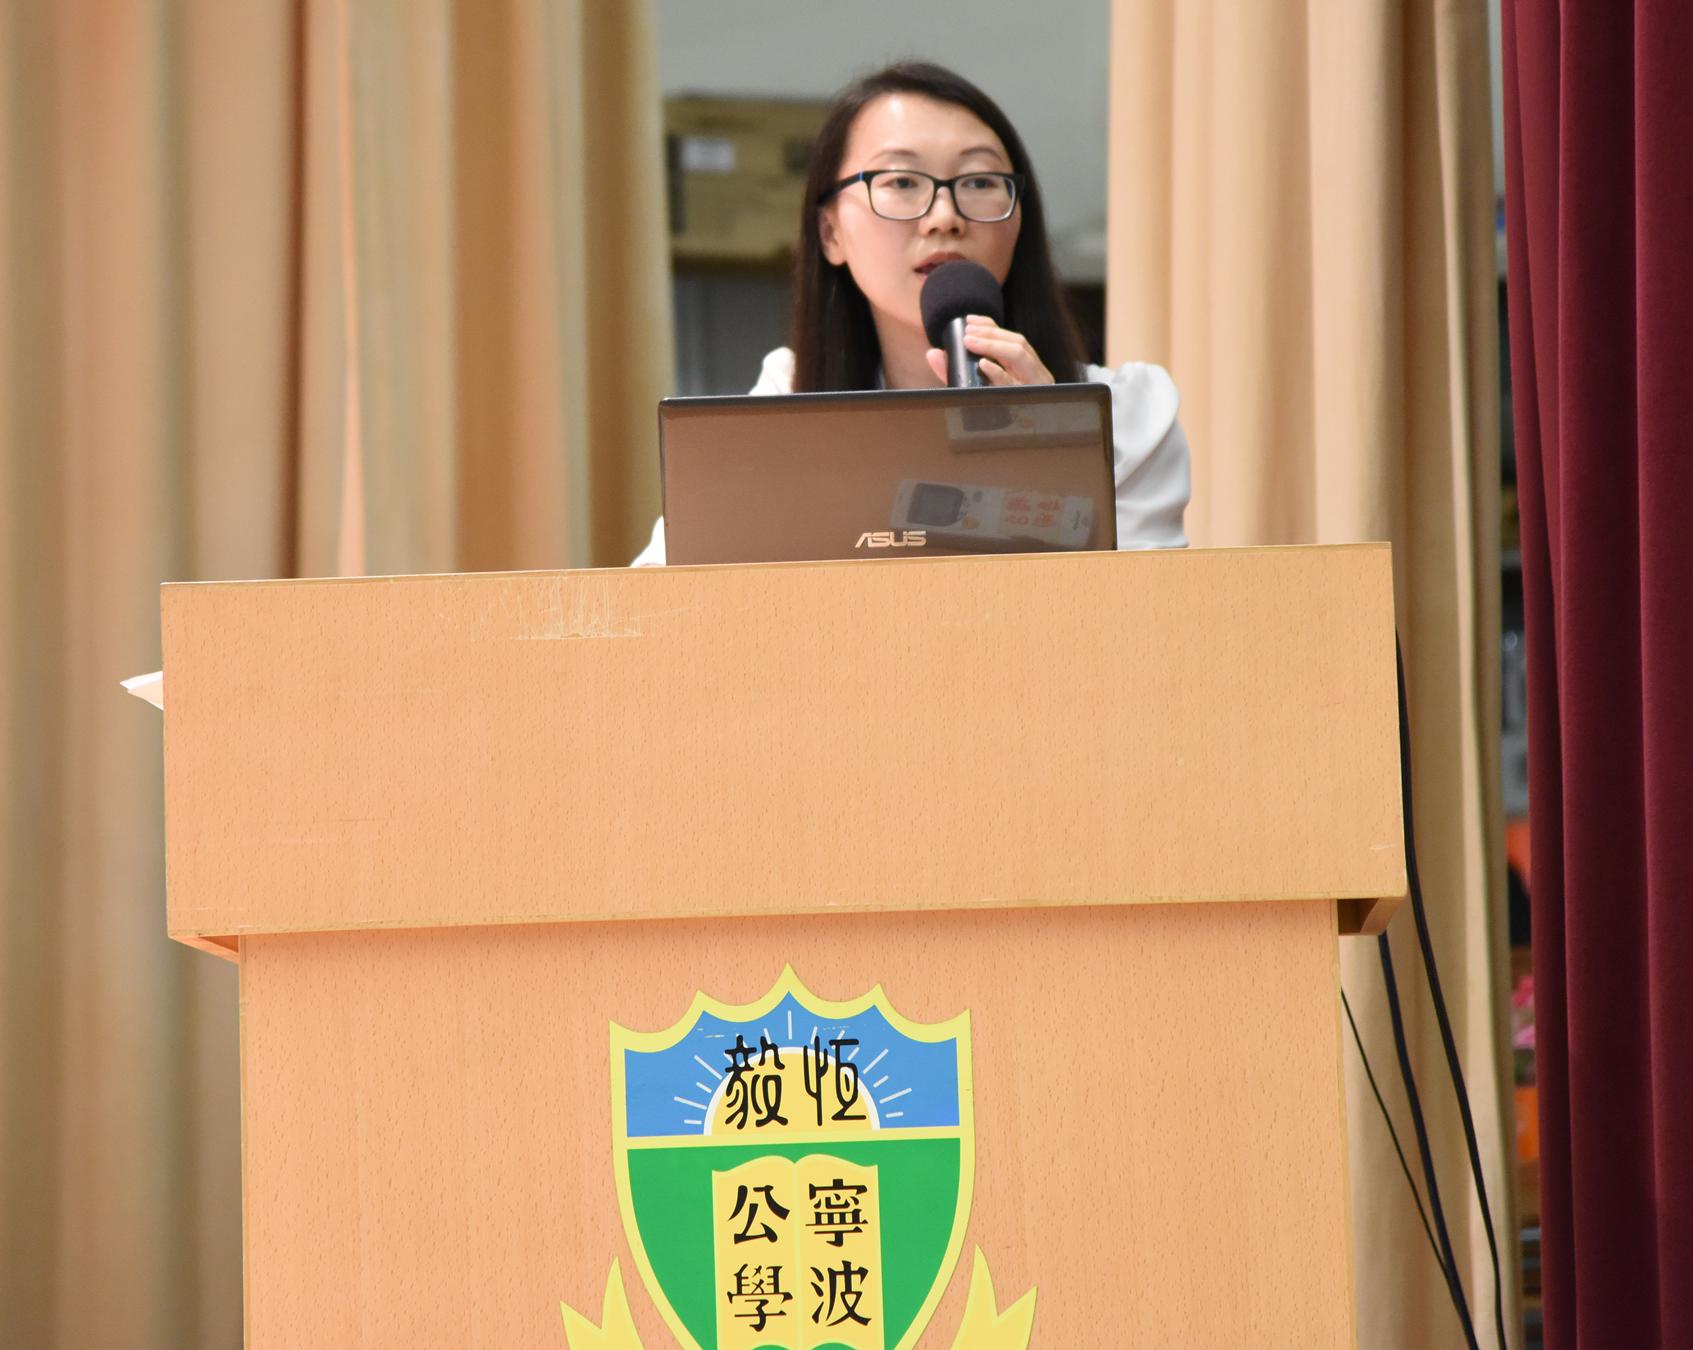 http://www.npc.edu.hk/sites/default/files/1_1398.jpg